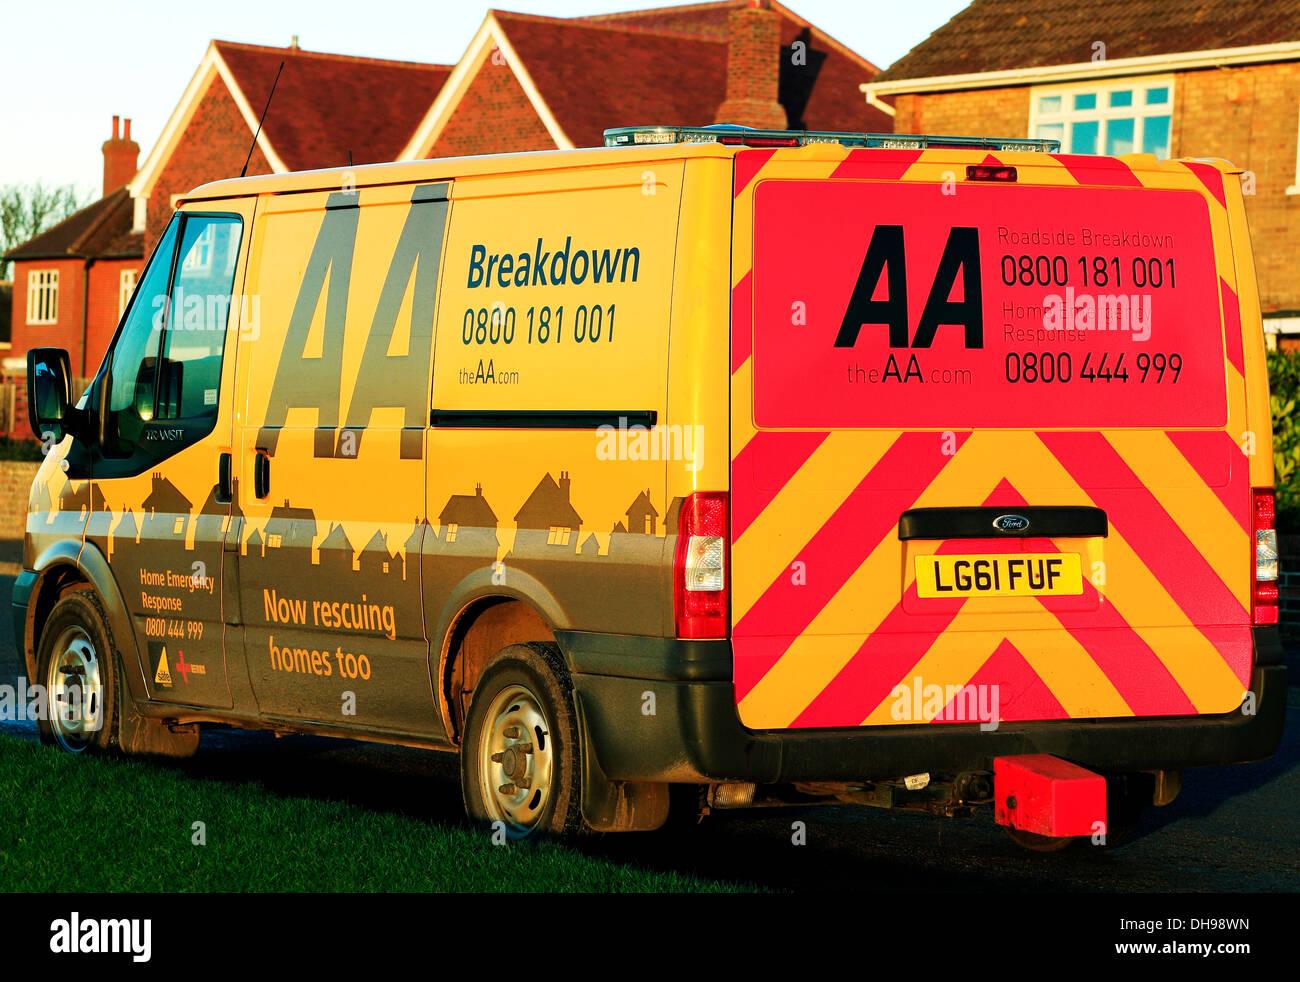 Desglose AA vehículo Inglaterra, home vehículos de emergencia en carreteras Imagen De Stock